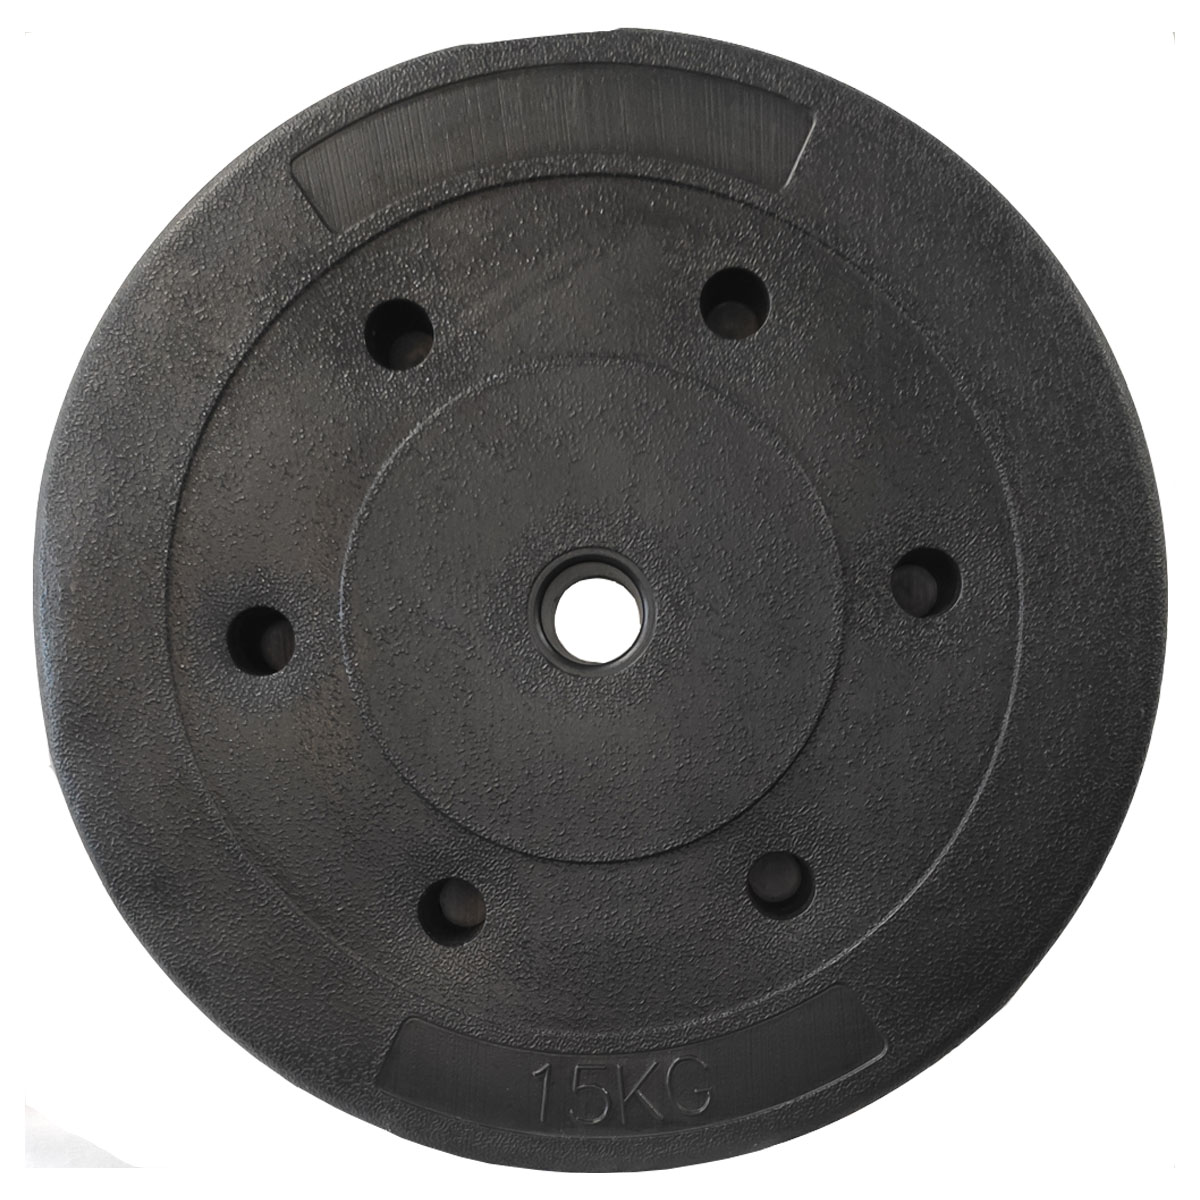 Anilha Furo Comum PVC - 15kg